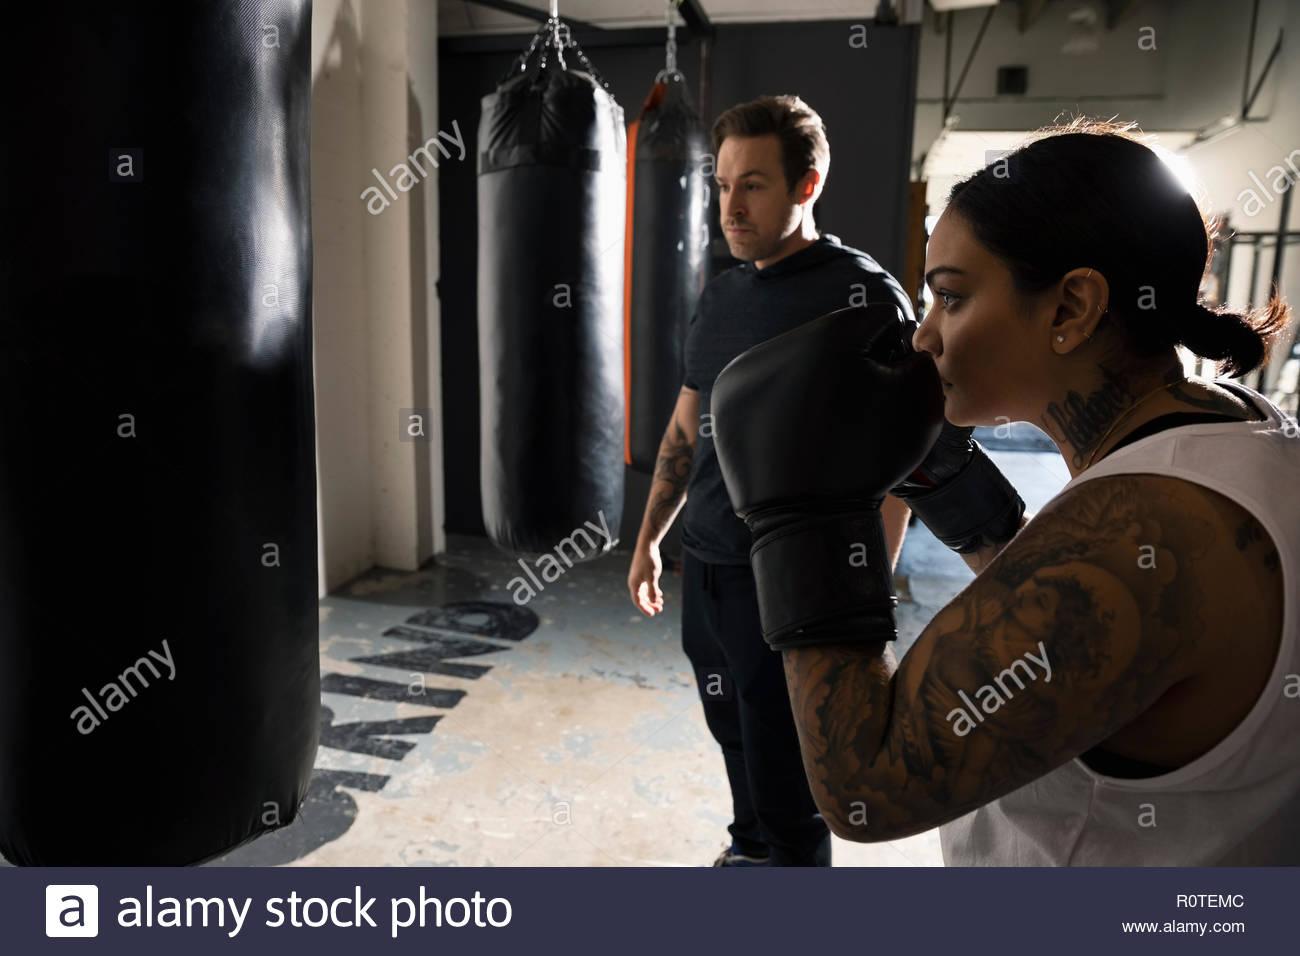 Female boxer training, boxing at punching bag in gym - Stock Image